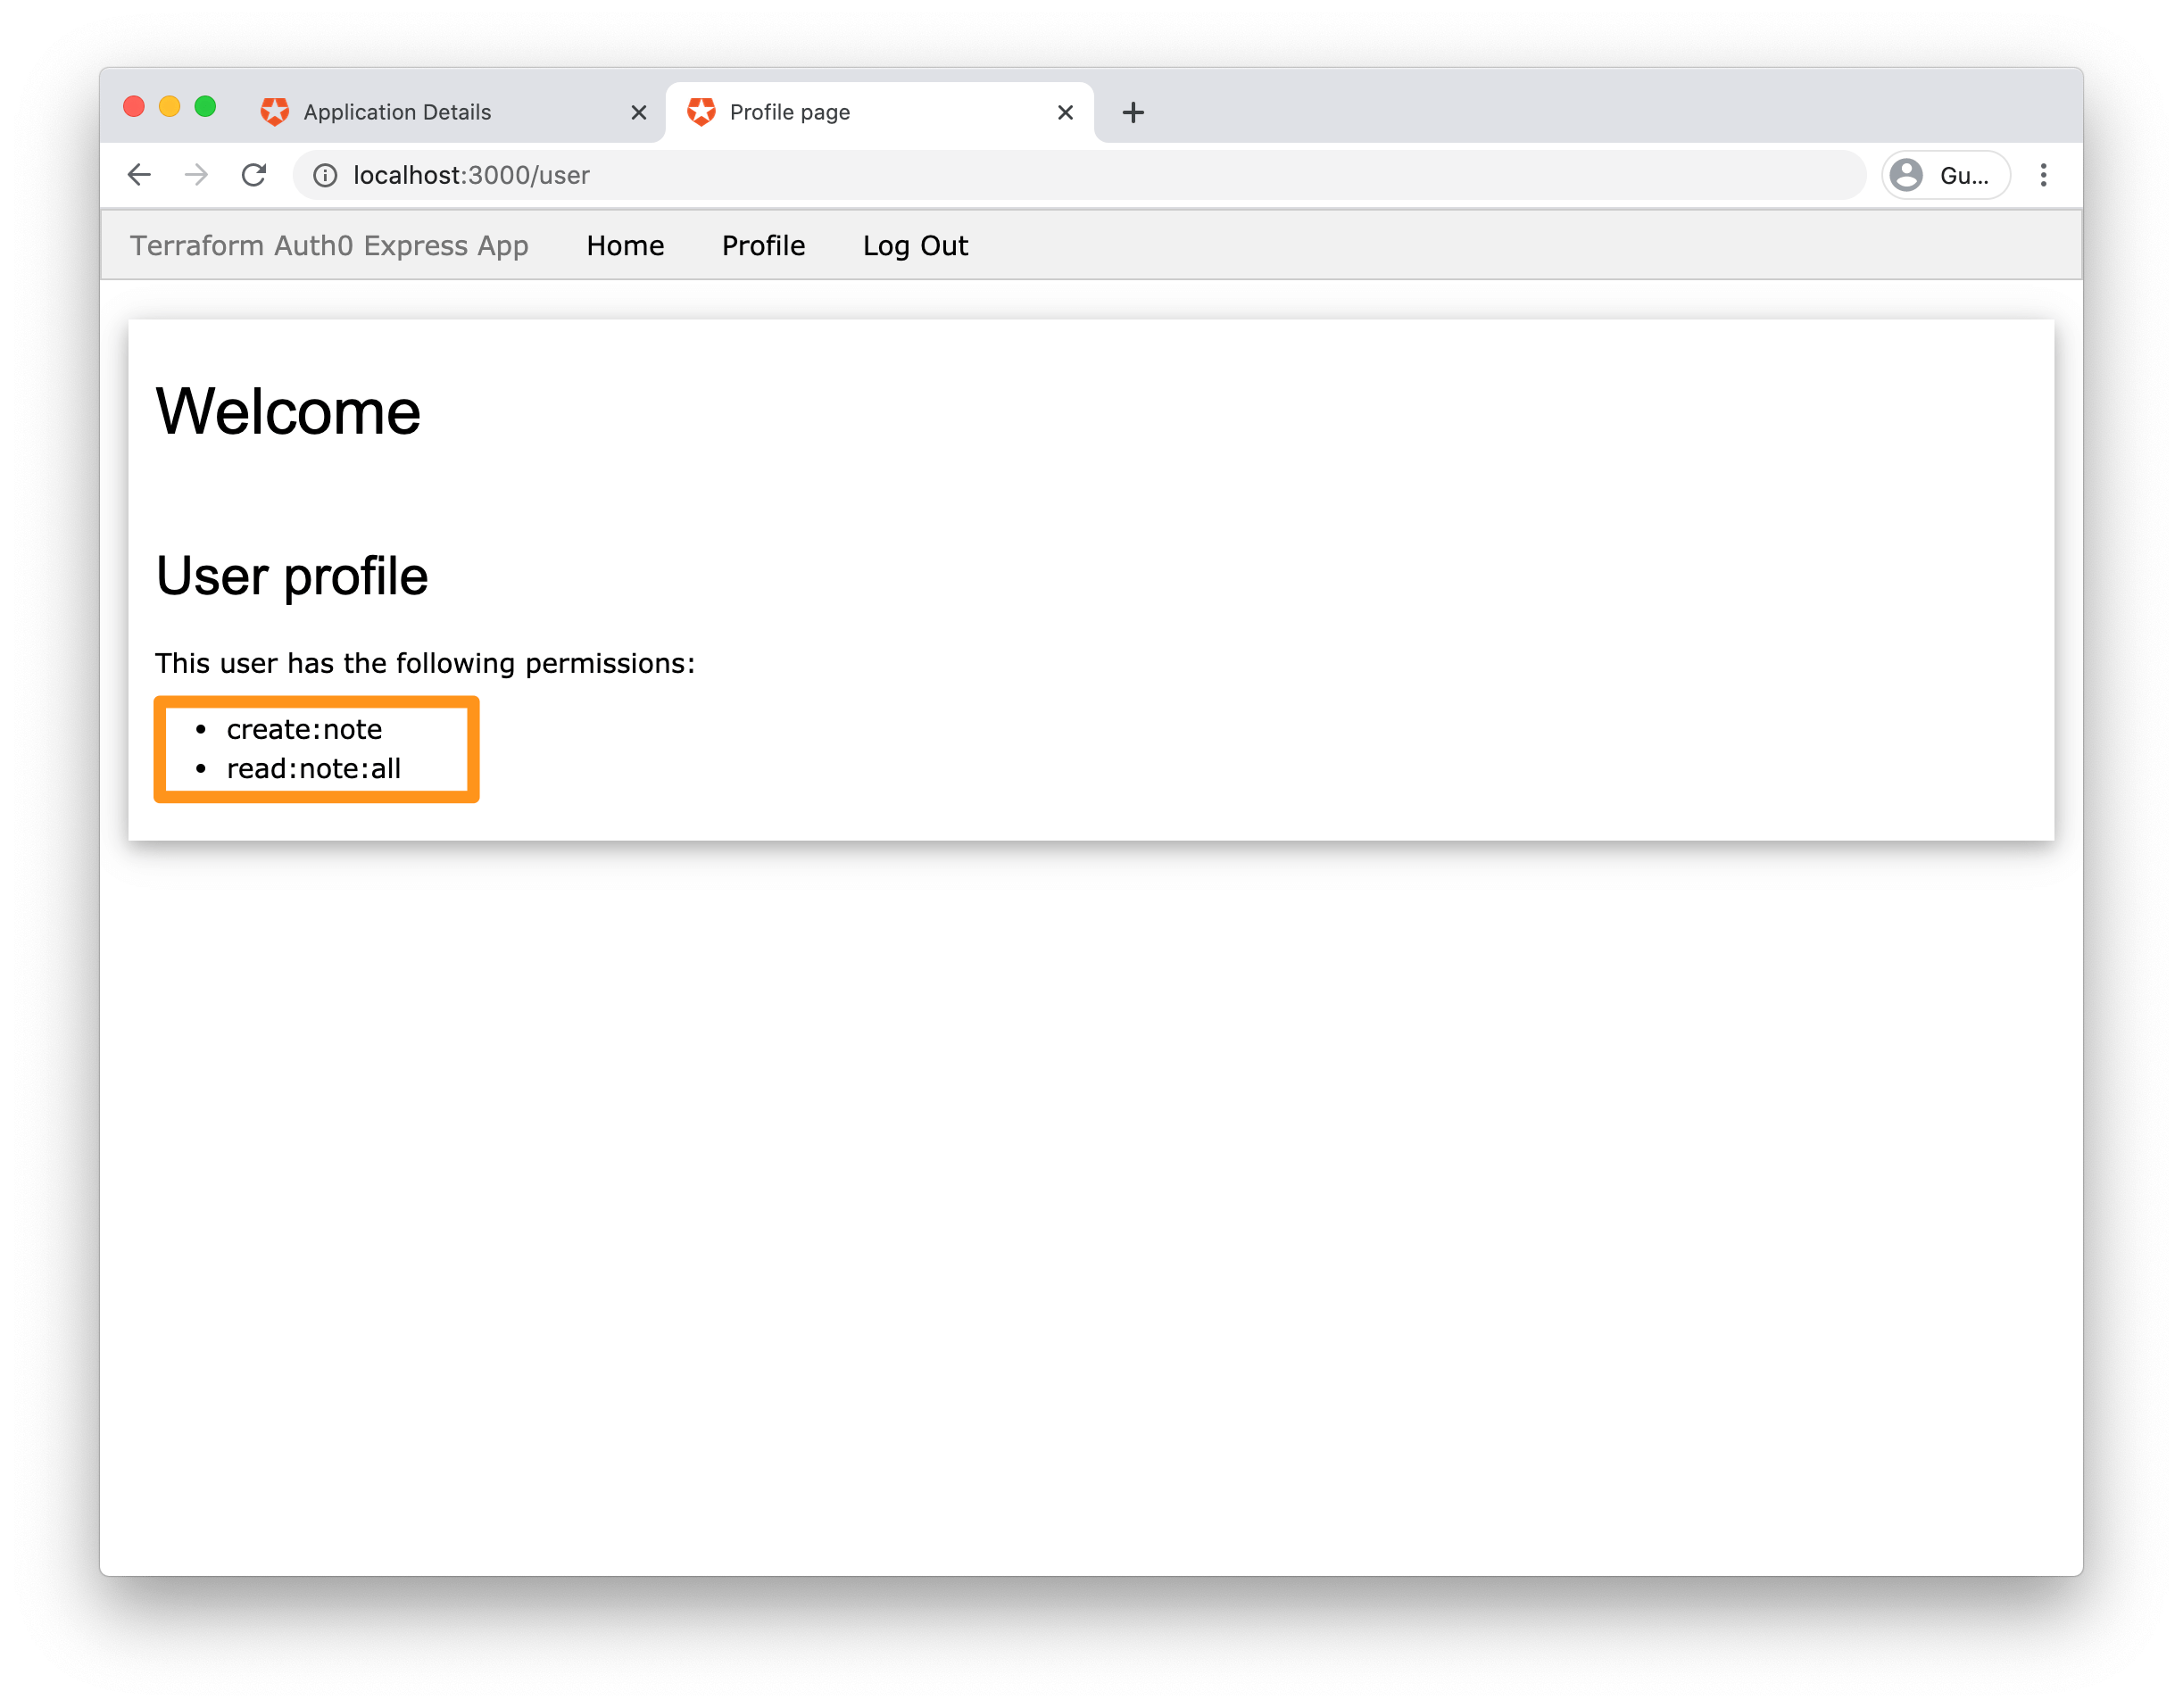 screenshot - admin permissions